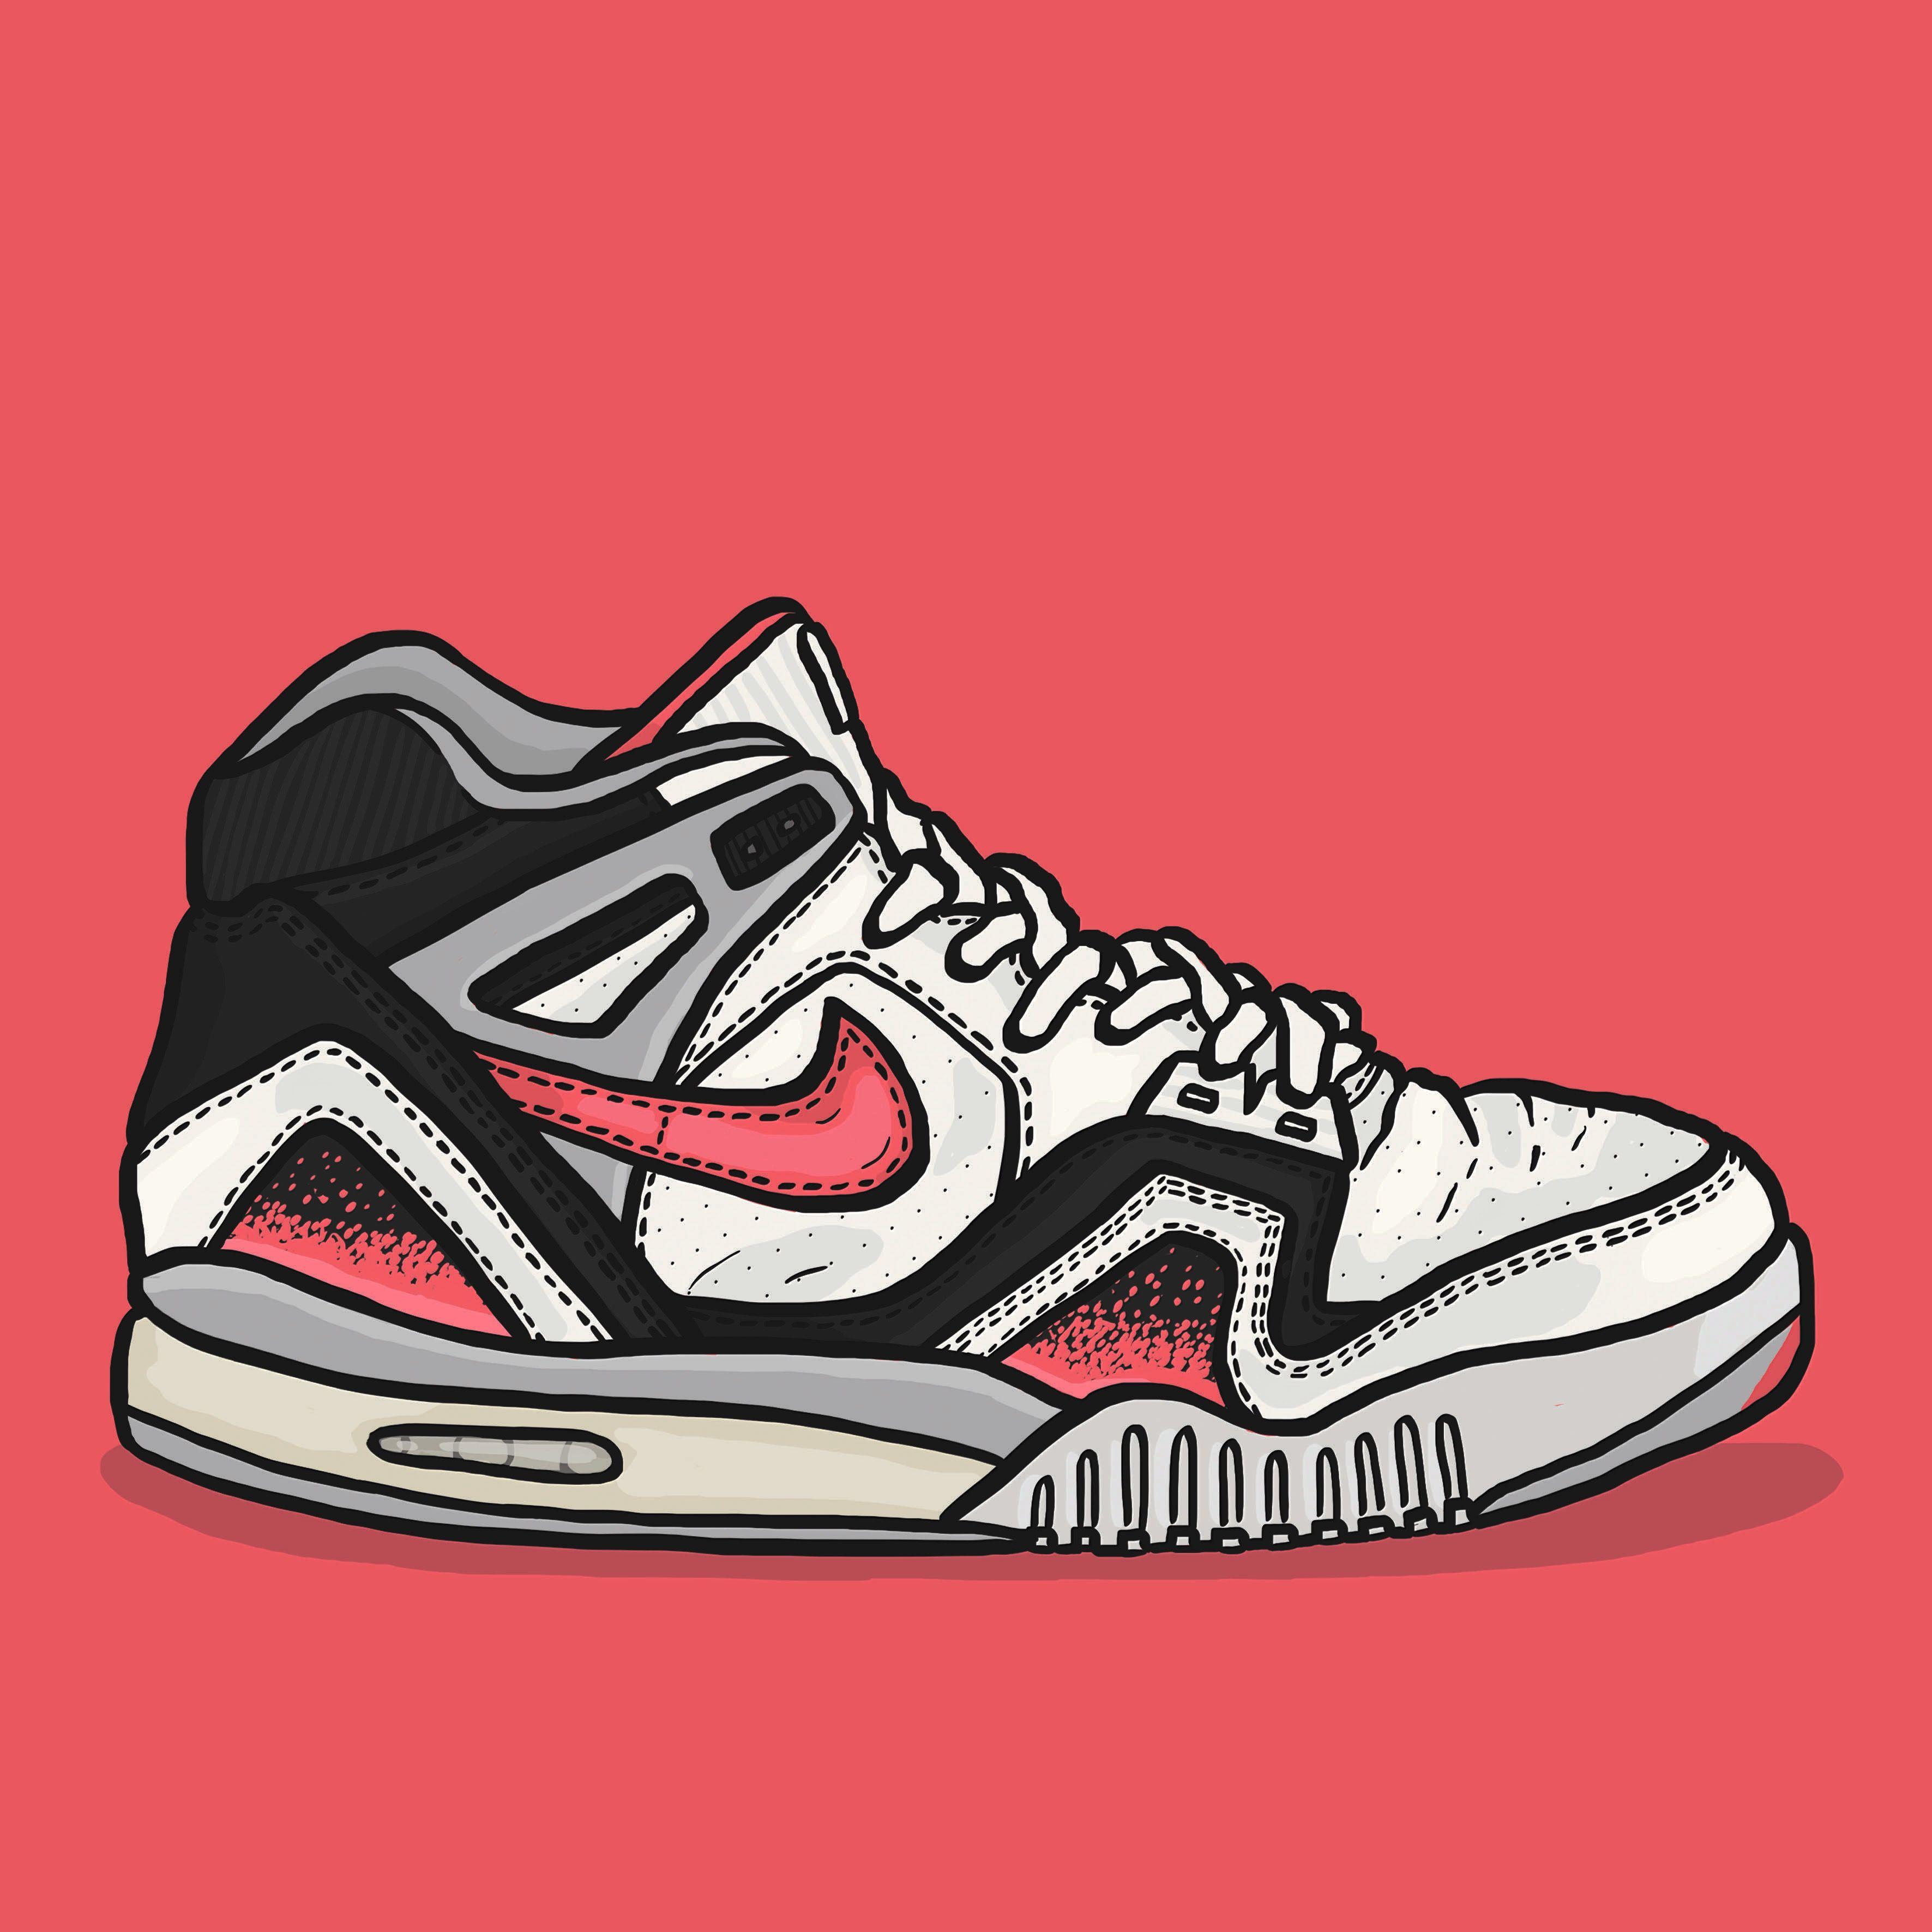 121ee4cbebf2 Nike Air Tech Challenge II hot lava  daleillustration sneaker art ...